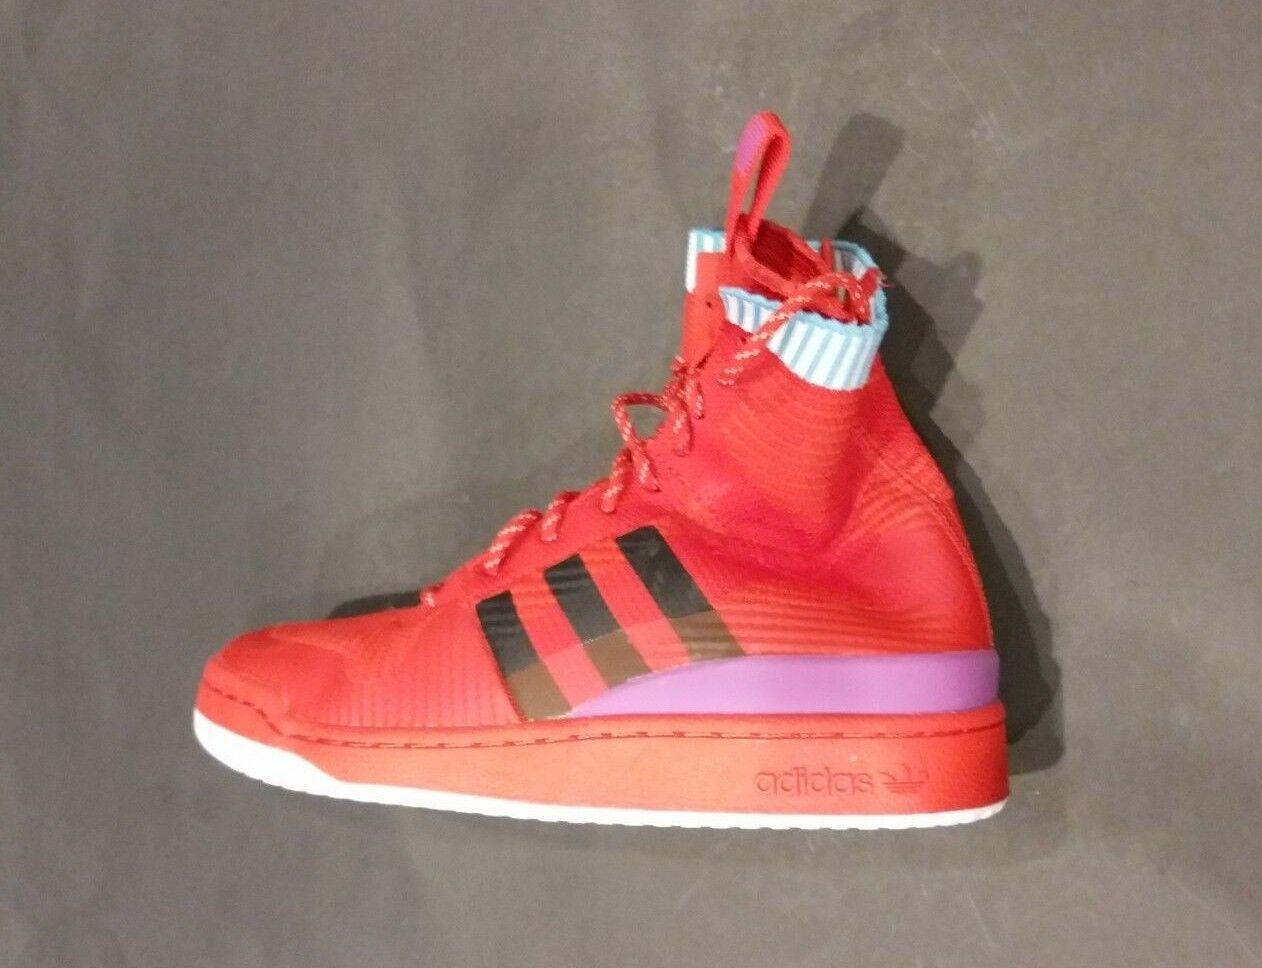 Adidas Forum Invierno PK Calzado De Baloncesto-Rojo-Para Hombre SZ-8